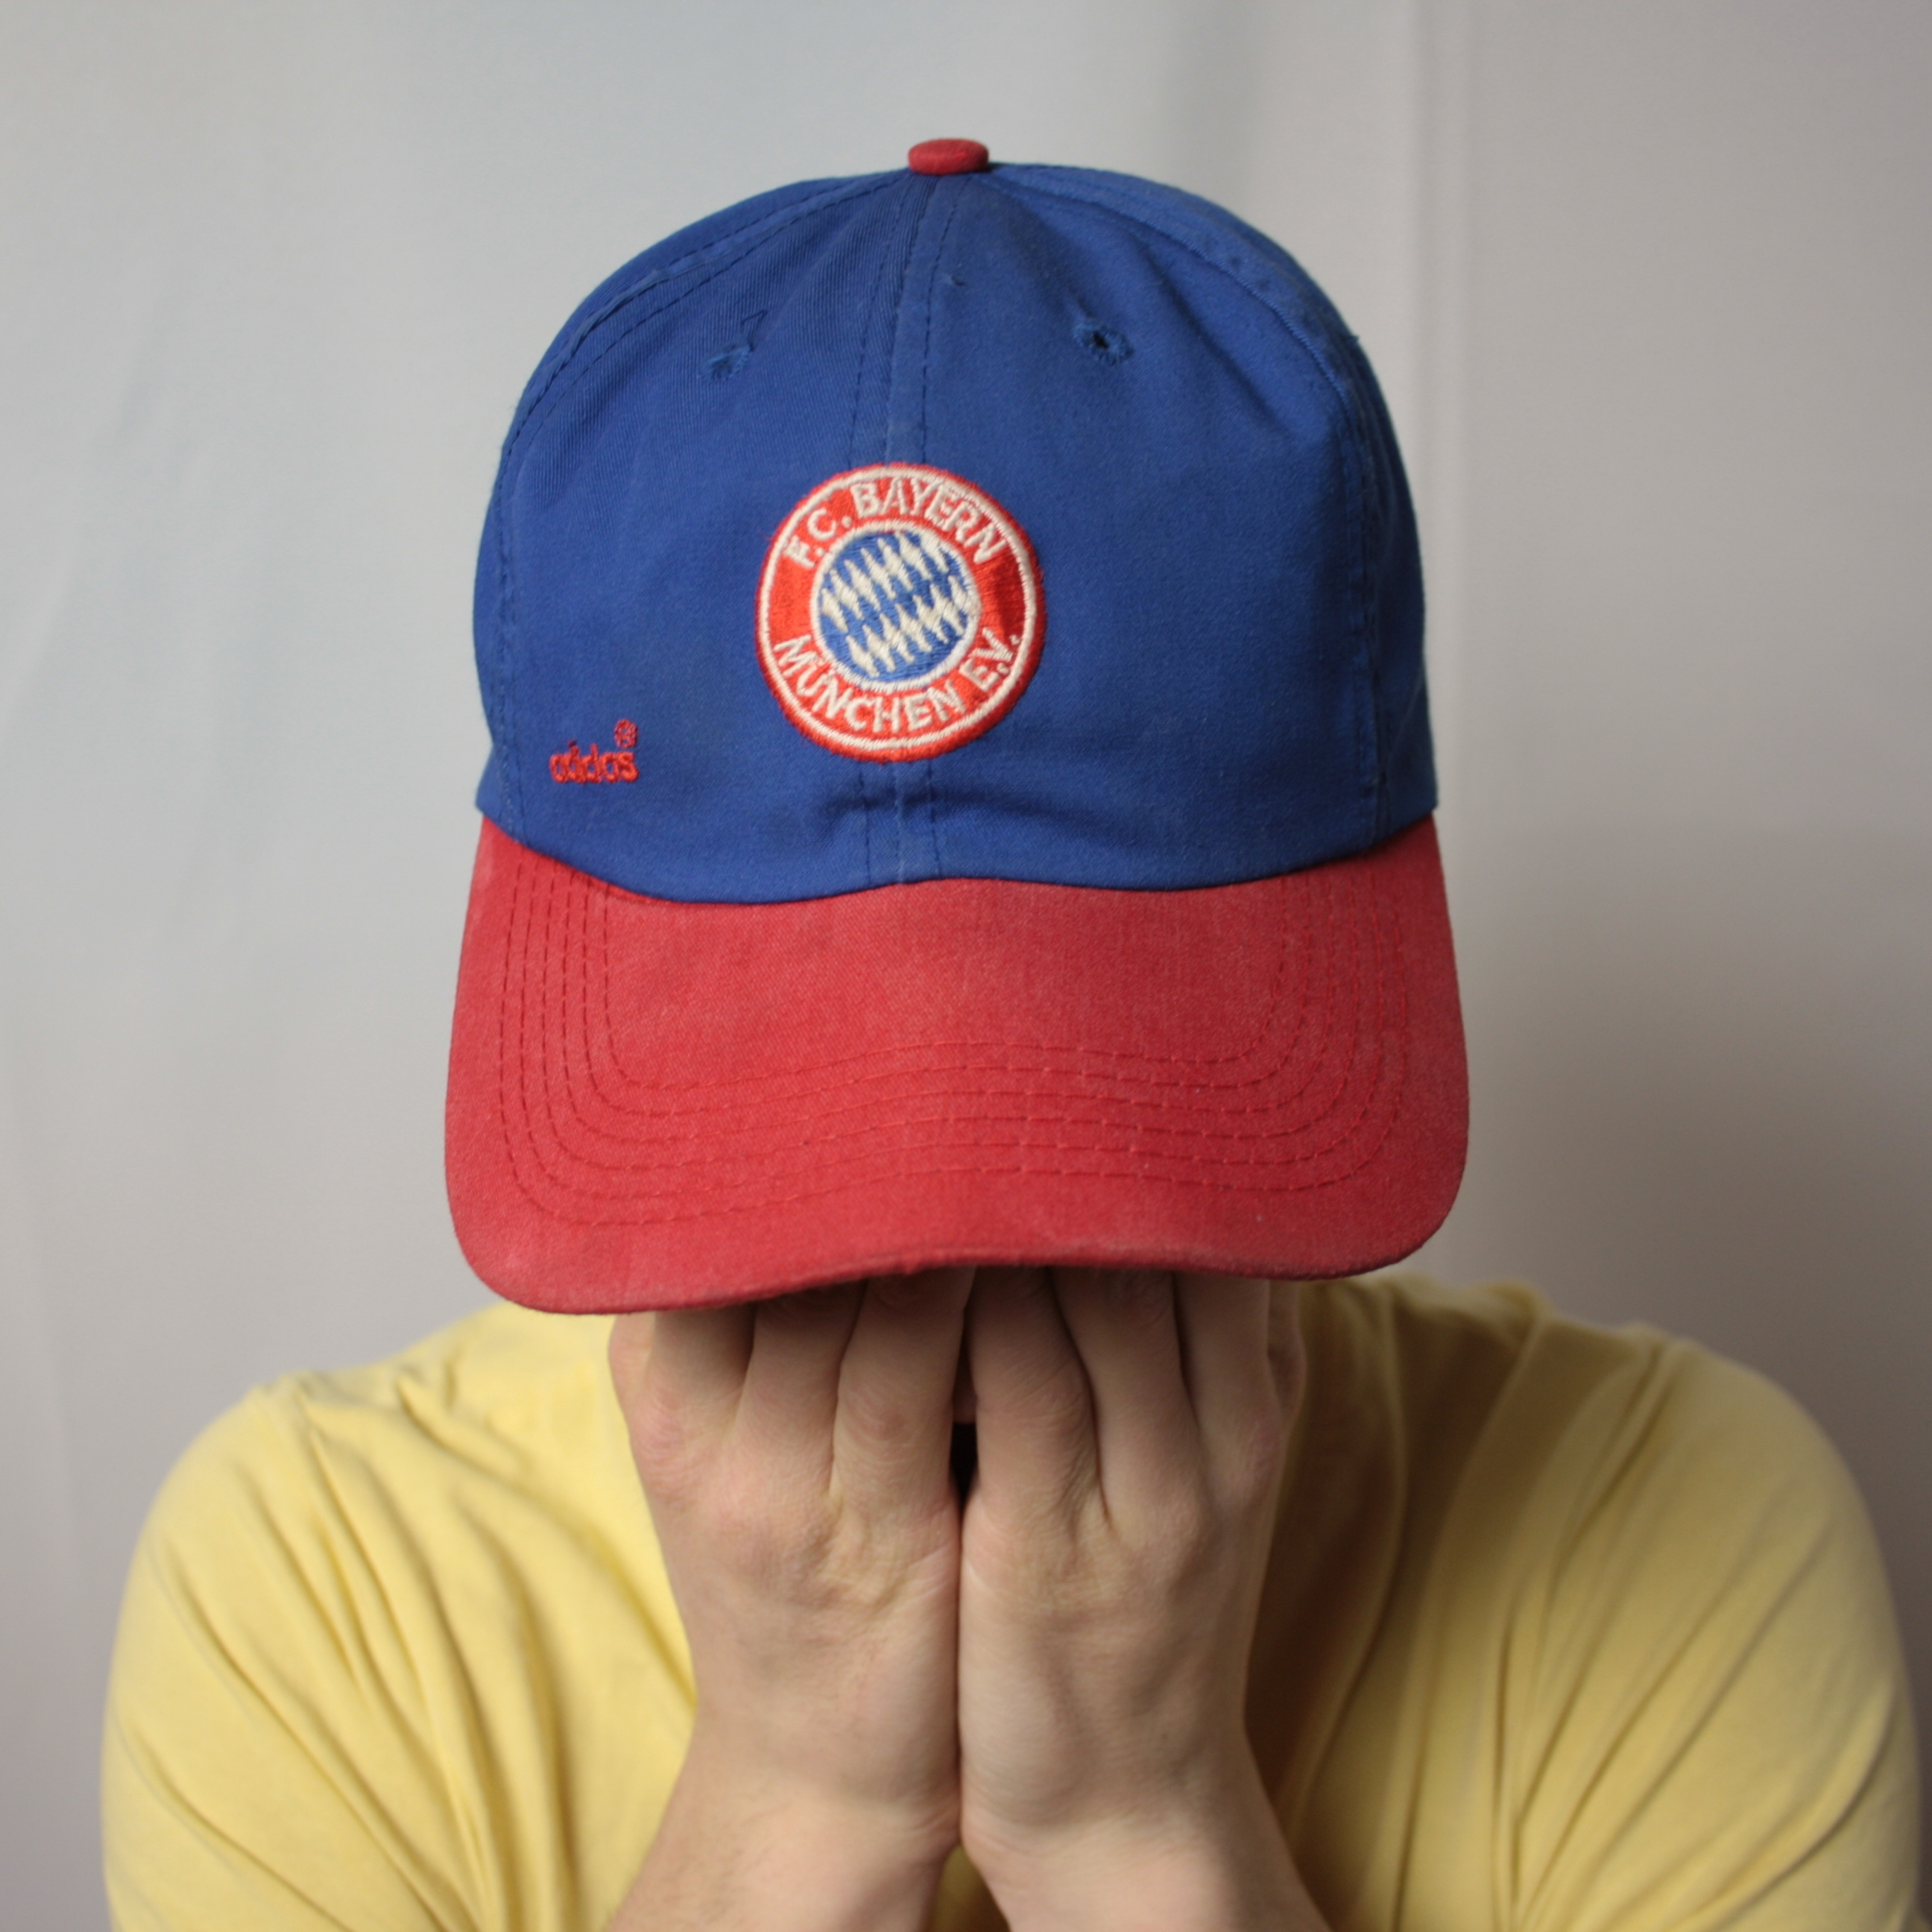 FCB Bayern M/ünchen Retro Cap